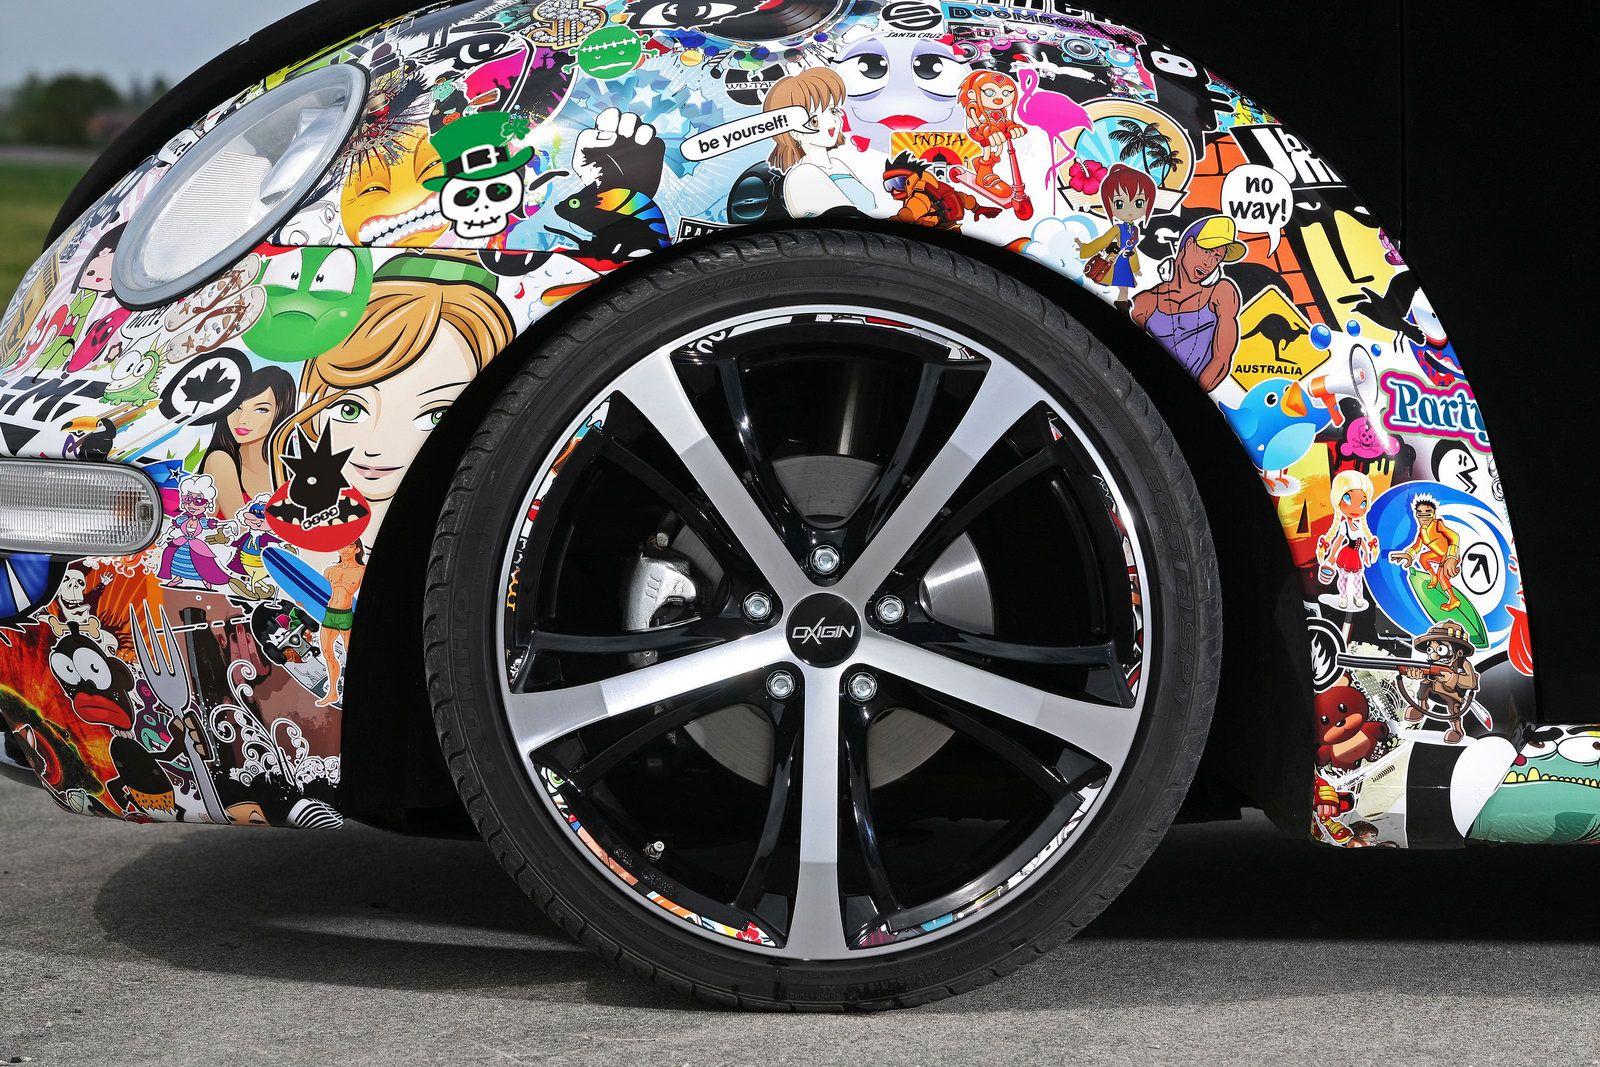 Audi r8 partial car wrapping sticker bomb stickerbomb by - Stickerbomb Folien Und G Nstige Car Wrapping 3d Klebefolieben Im Sticker Bomb Style Container Gardening Ideas Pinterest Sticker Bomb And Jdm